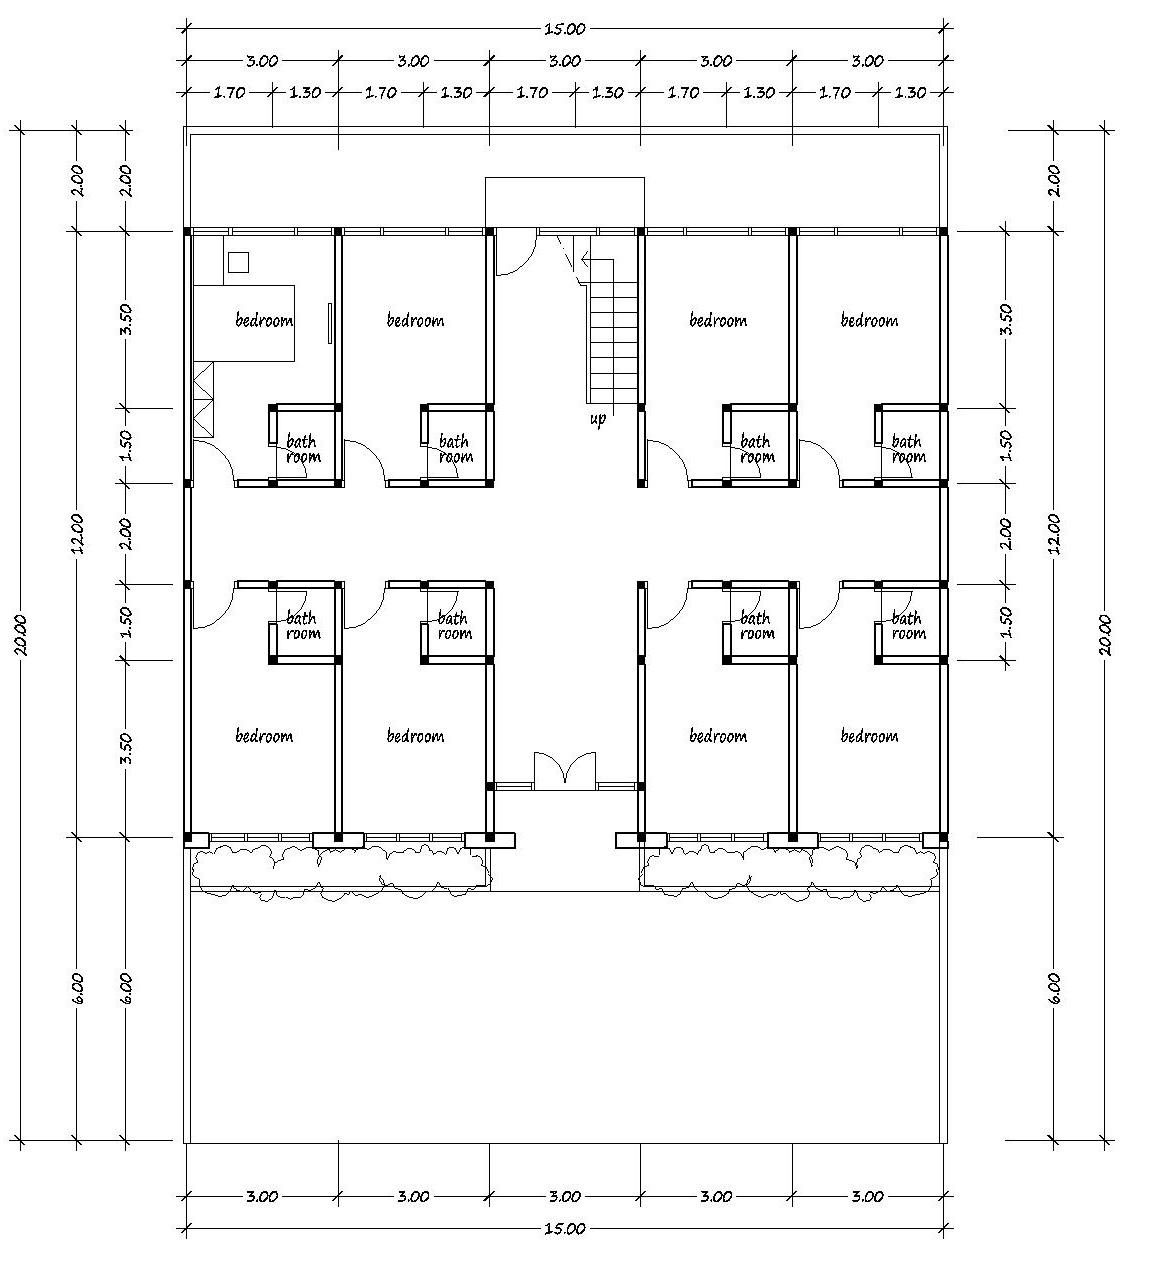 1st%2Bboarding%2Bhouse%2B2 boarding house plans,Boarding House Plans